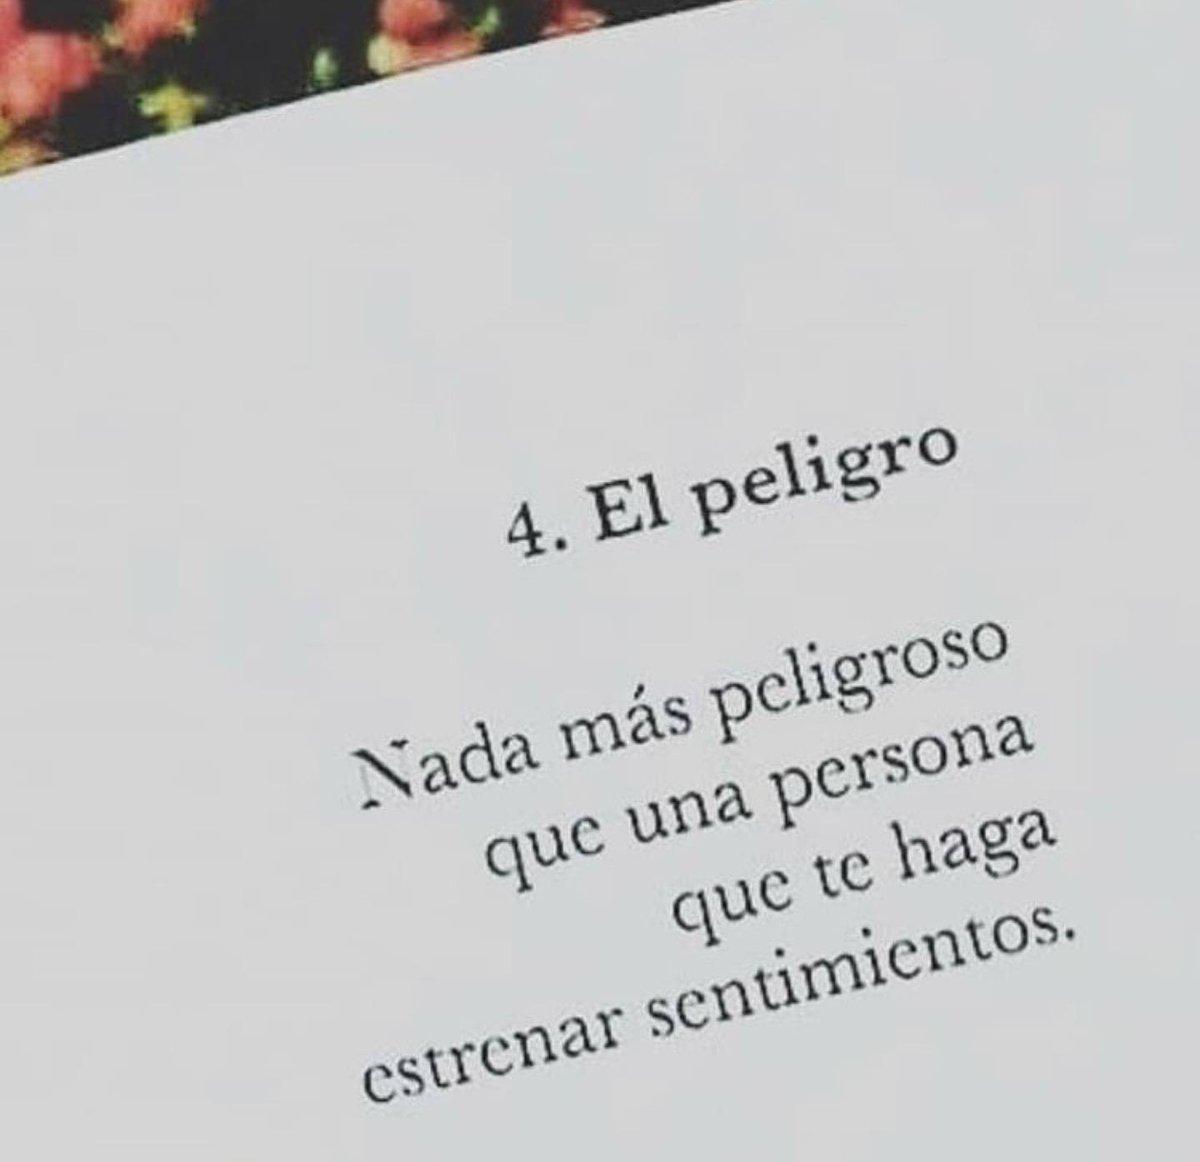 Quijotadas De Amor On Twitter Quijotadasdeamor Uff Estrenar